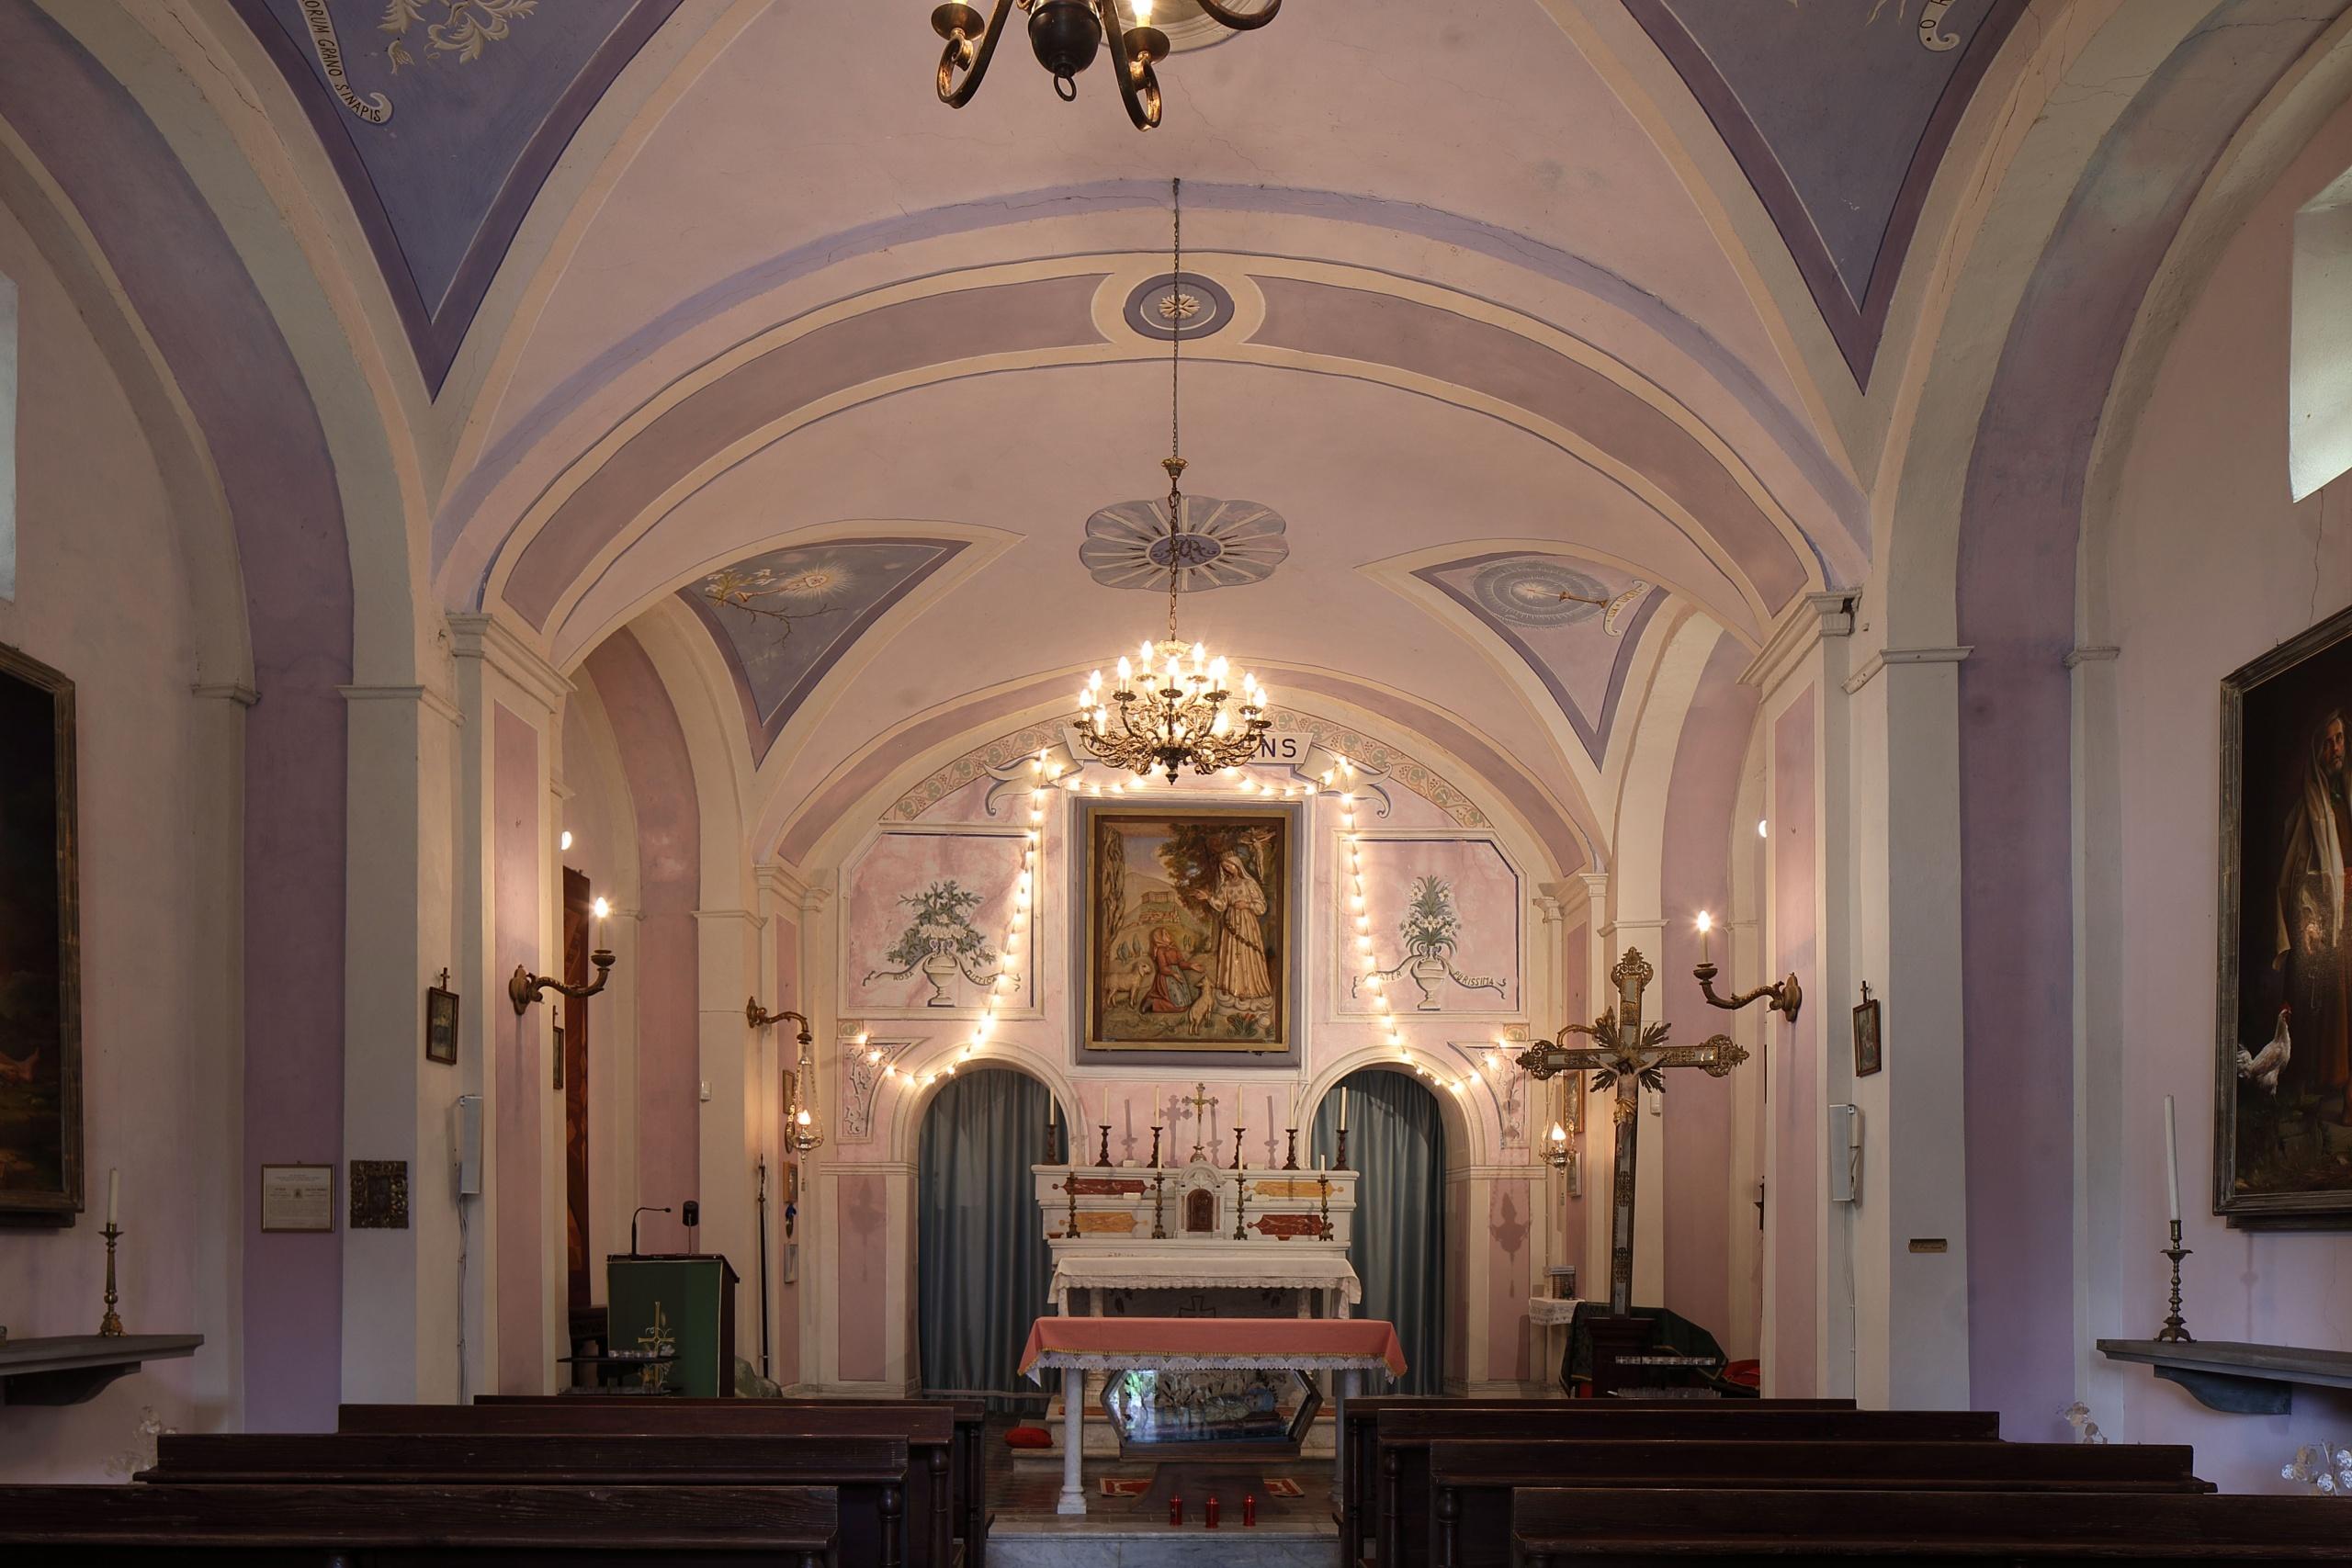 Santuario della Madonna del Faggio